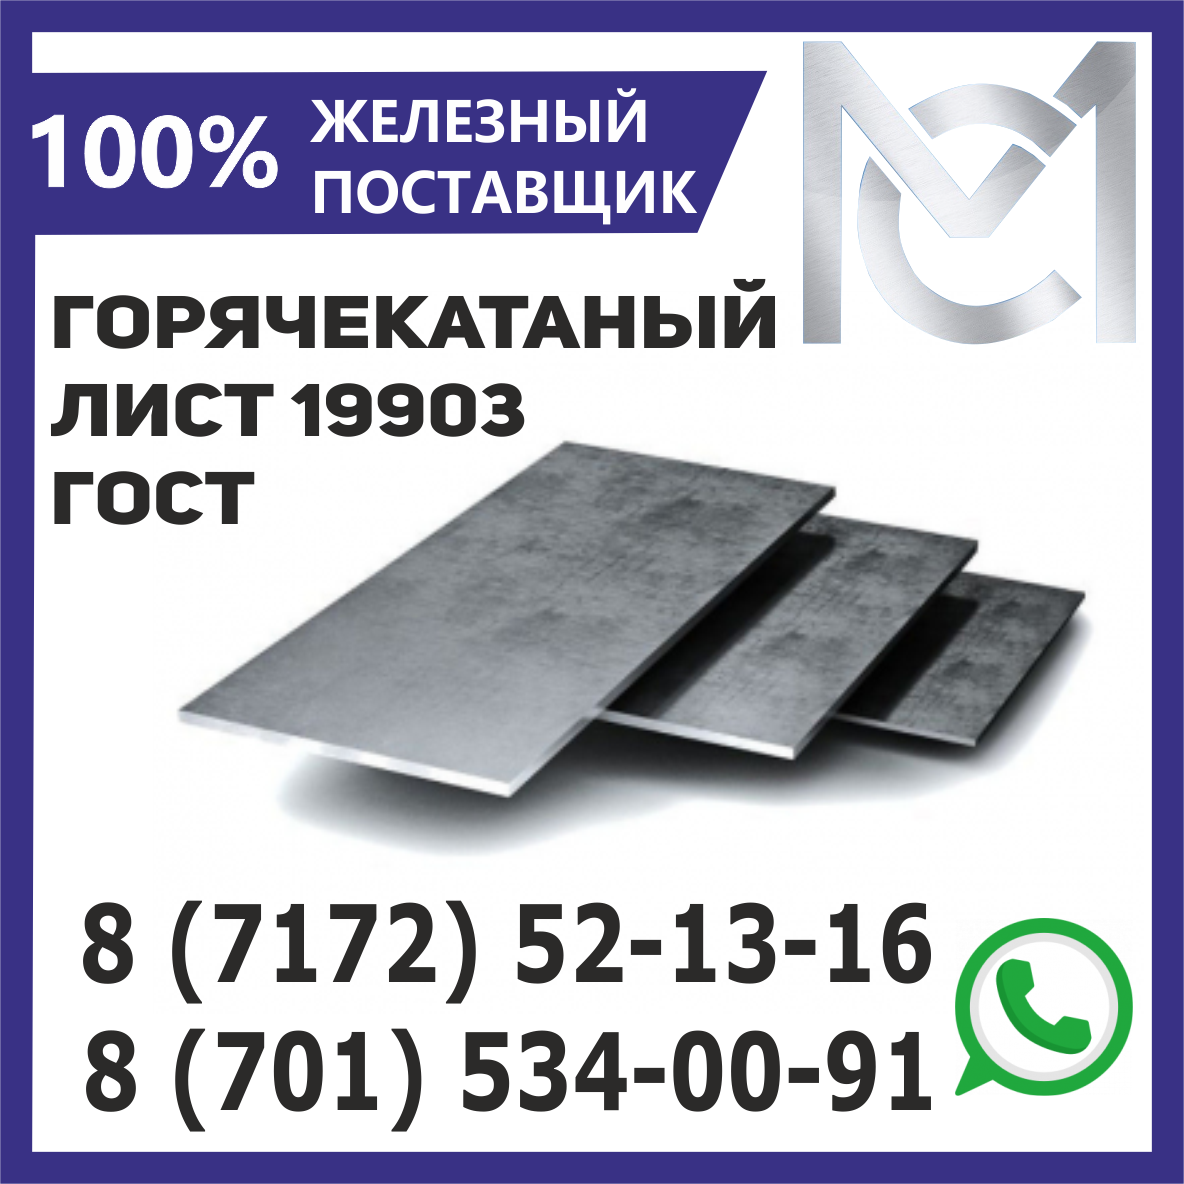 Лист 40 горячекатаный ГОСТ 19903-74, 1,5х6,0 м.